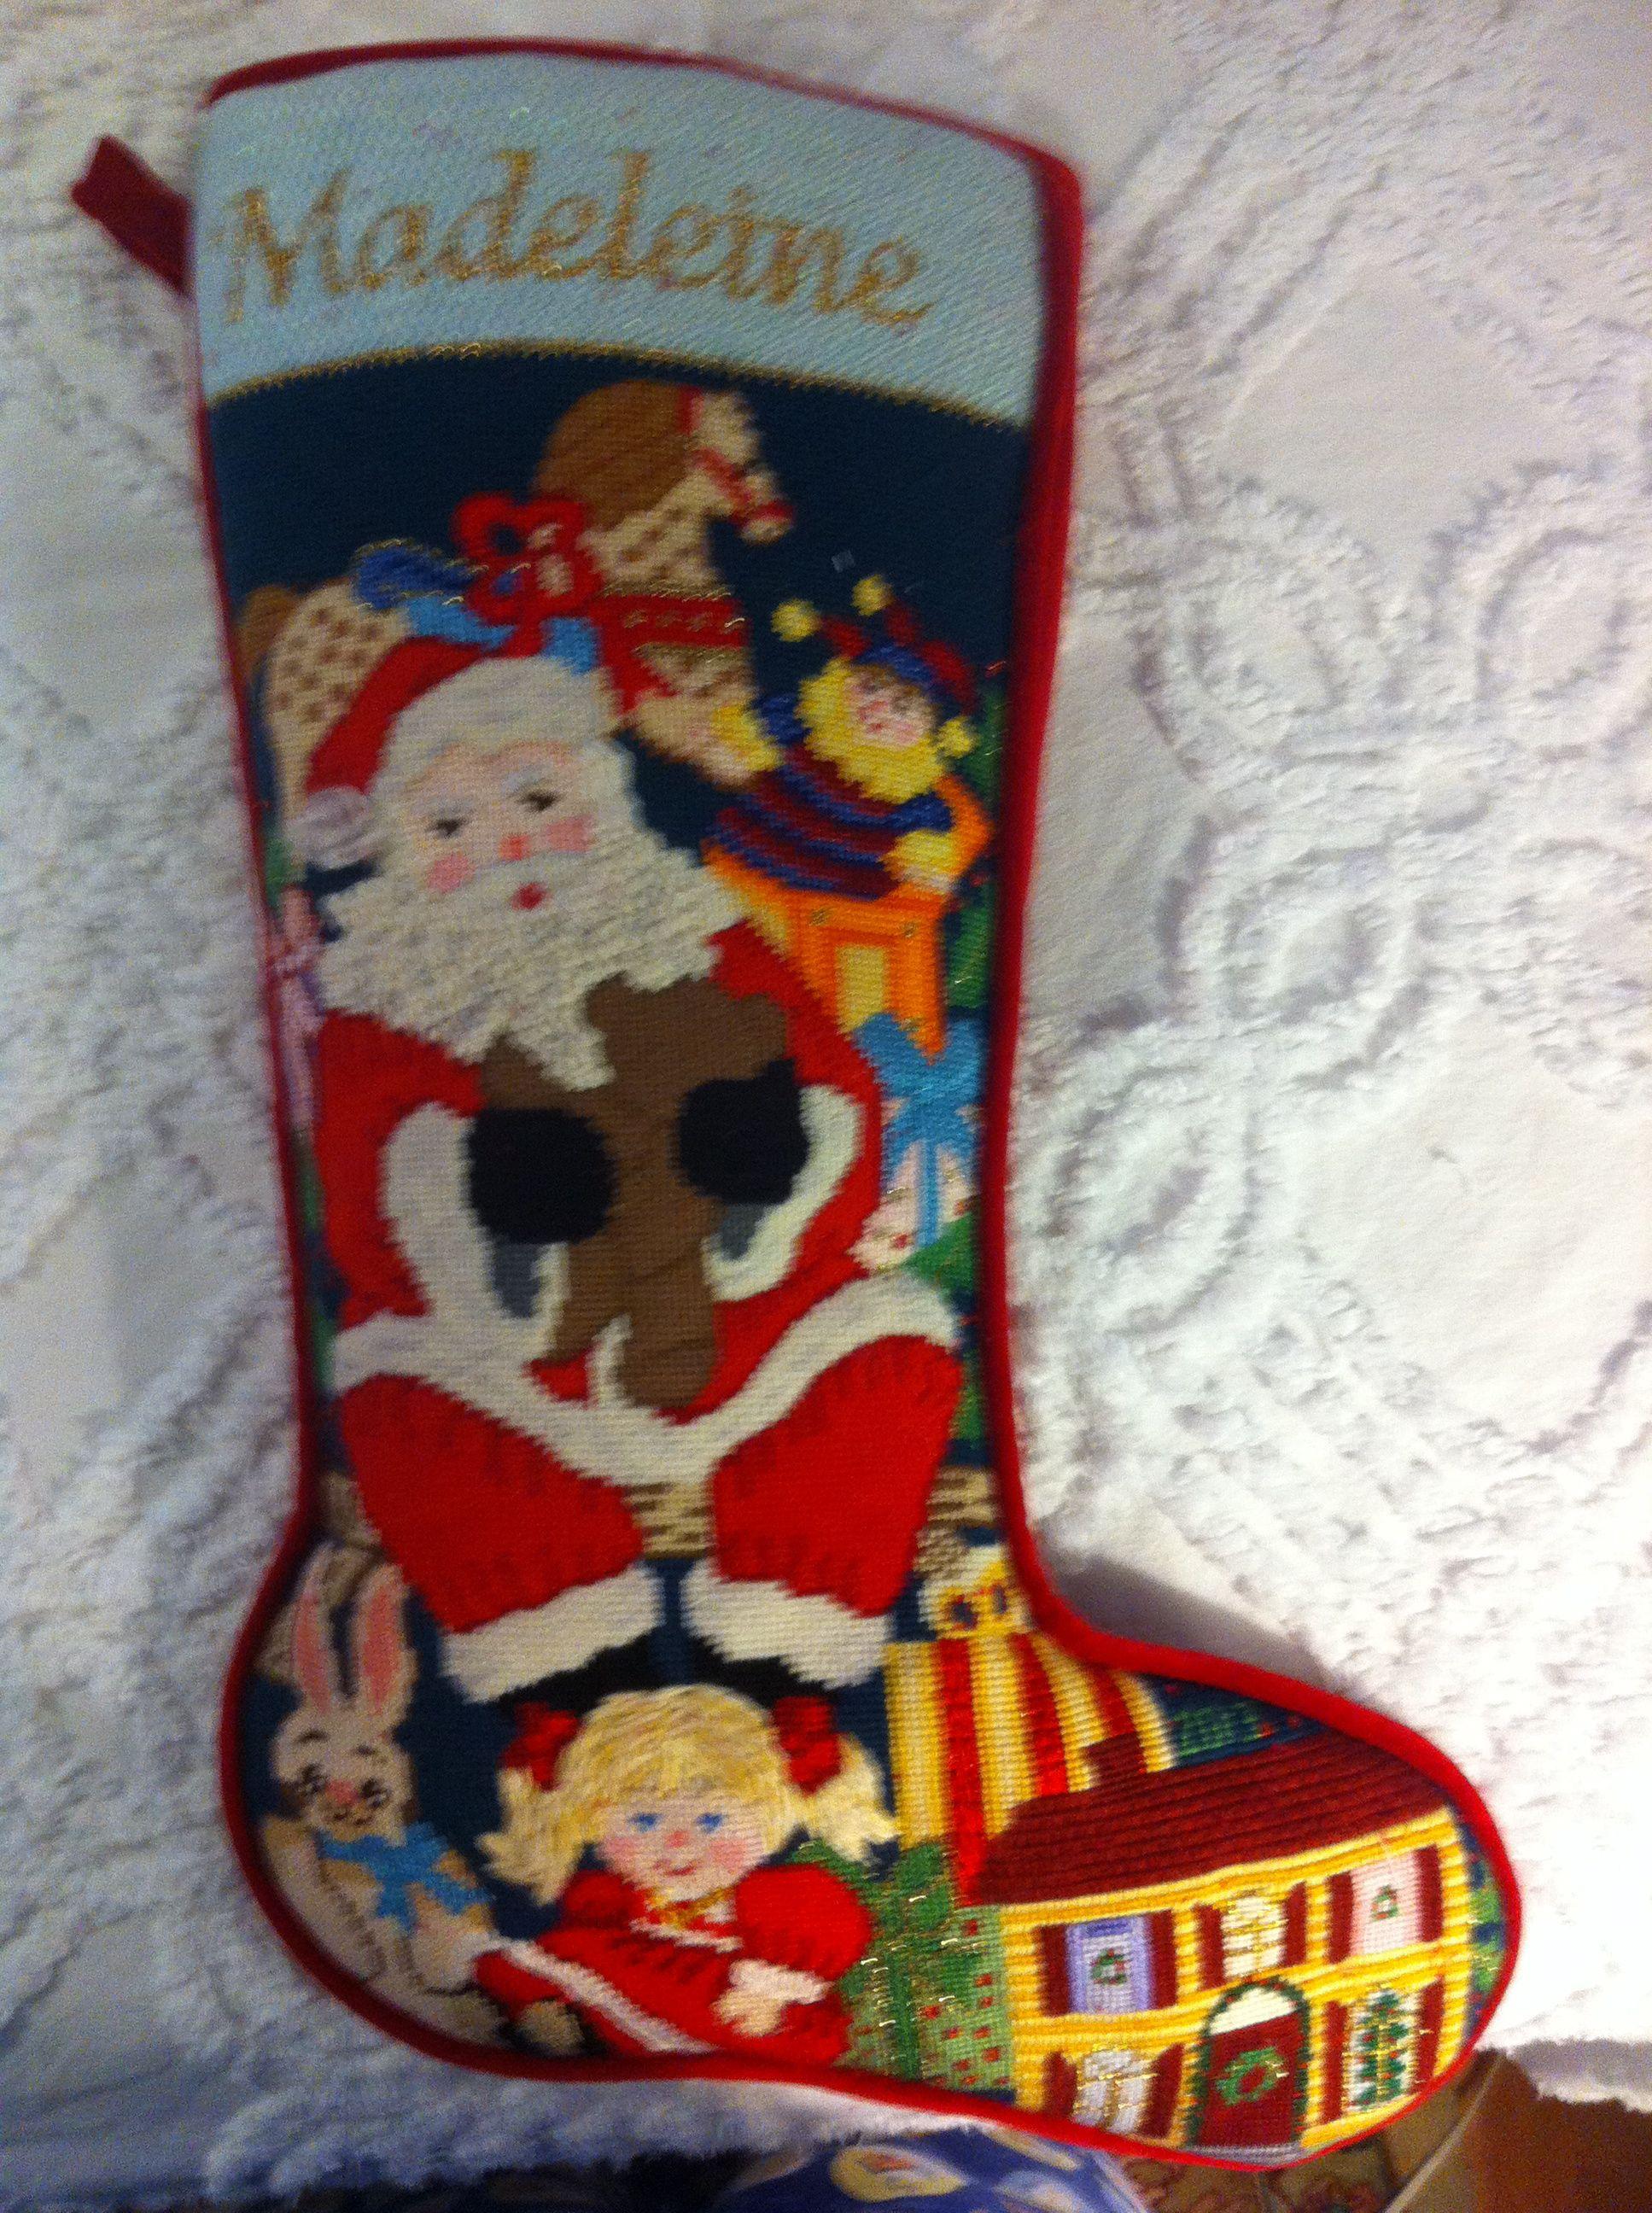 Madeleines stocking christmas stockings holiday decor